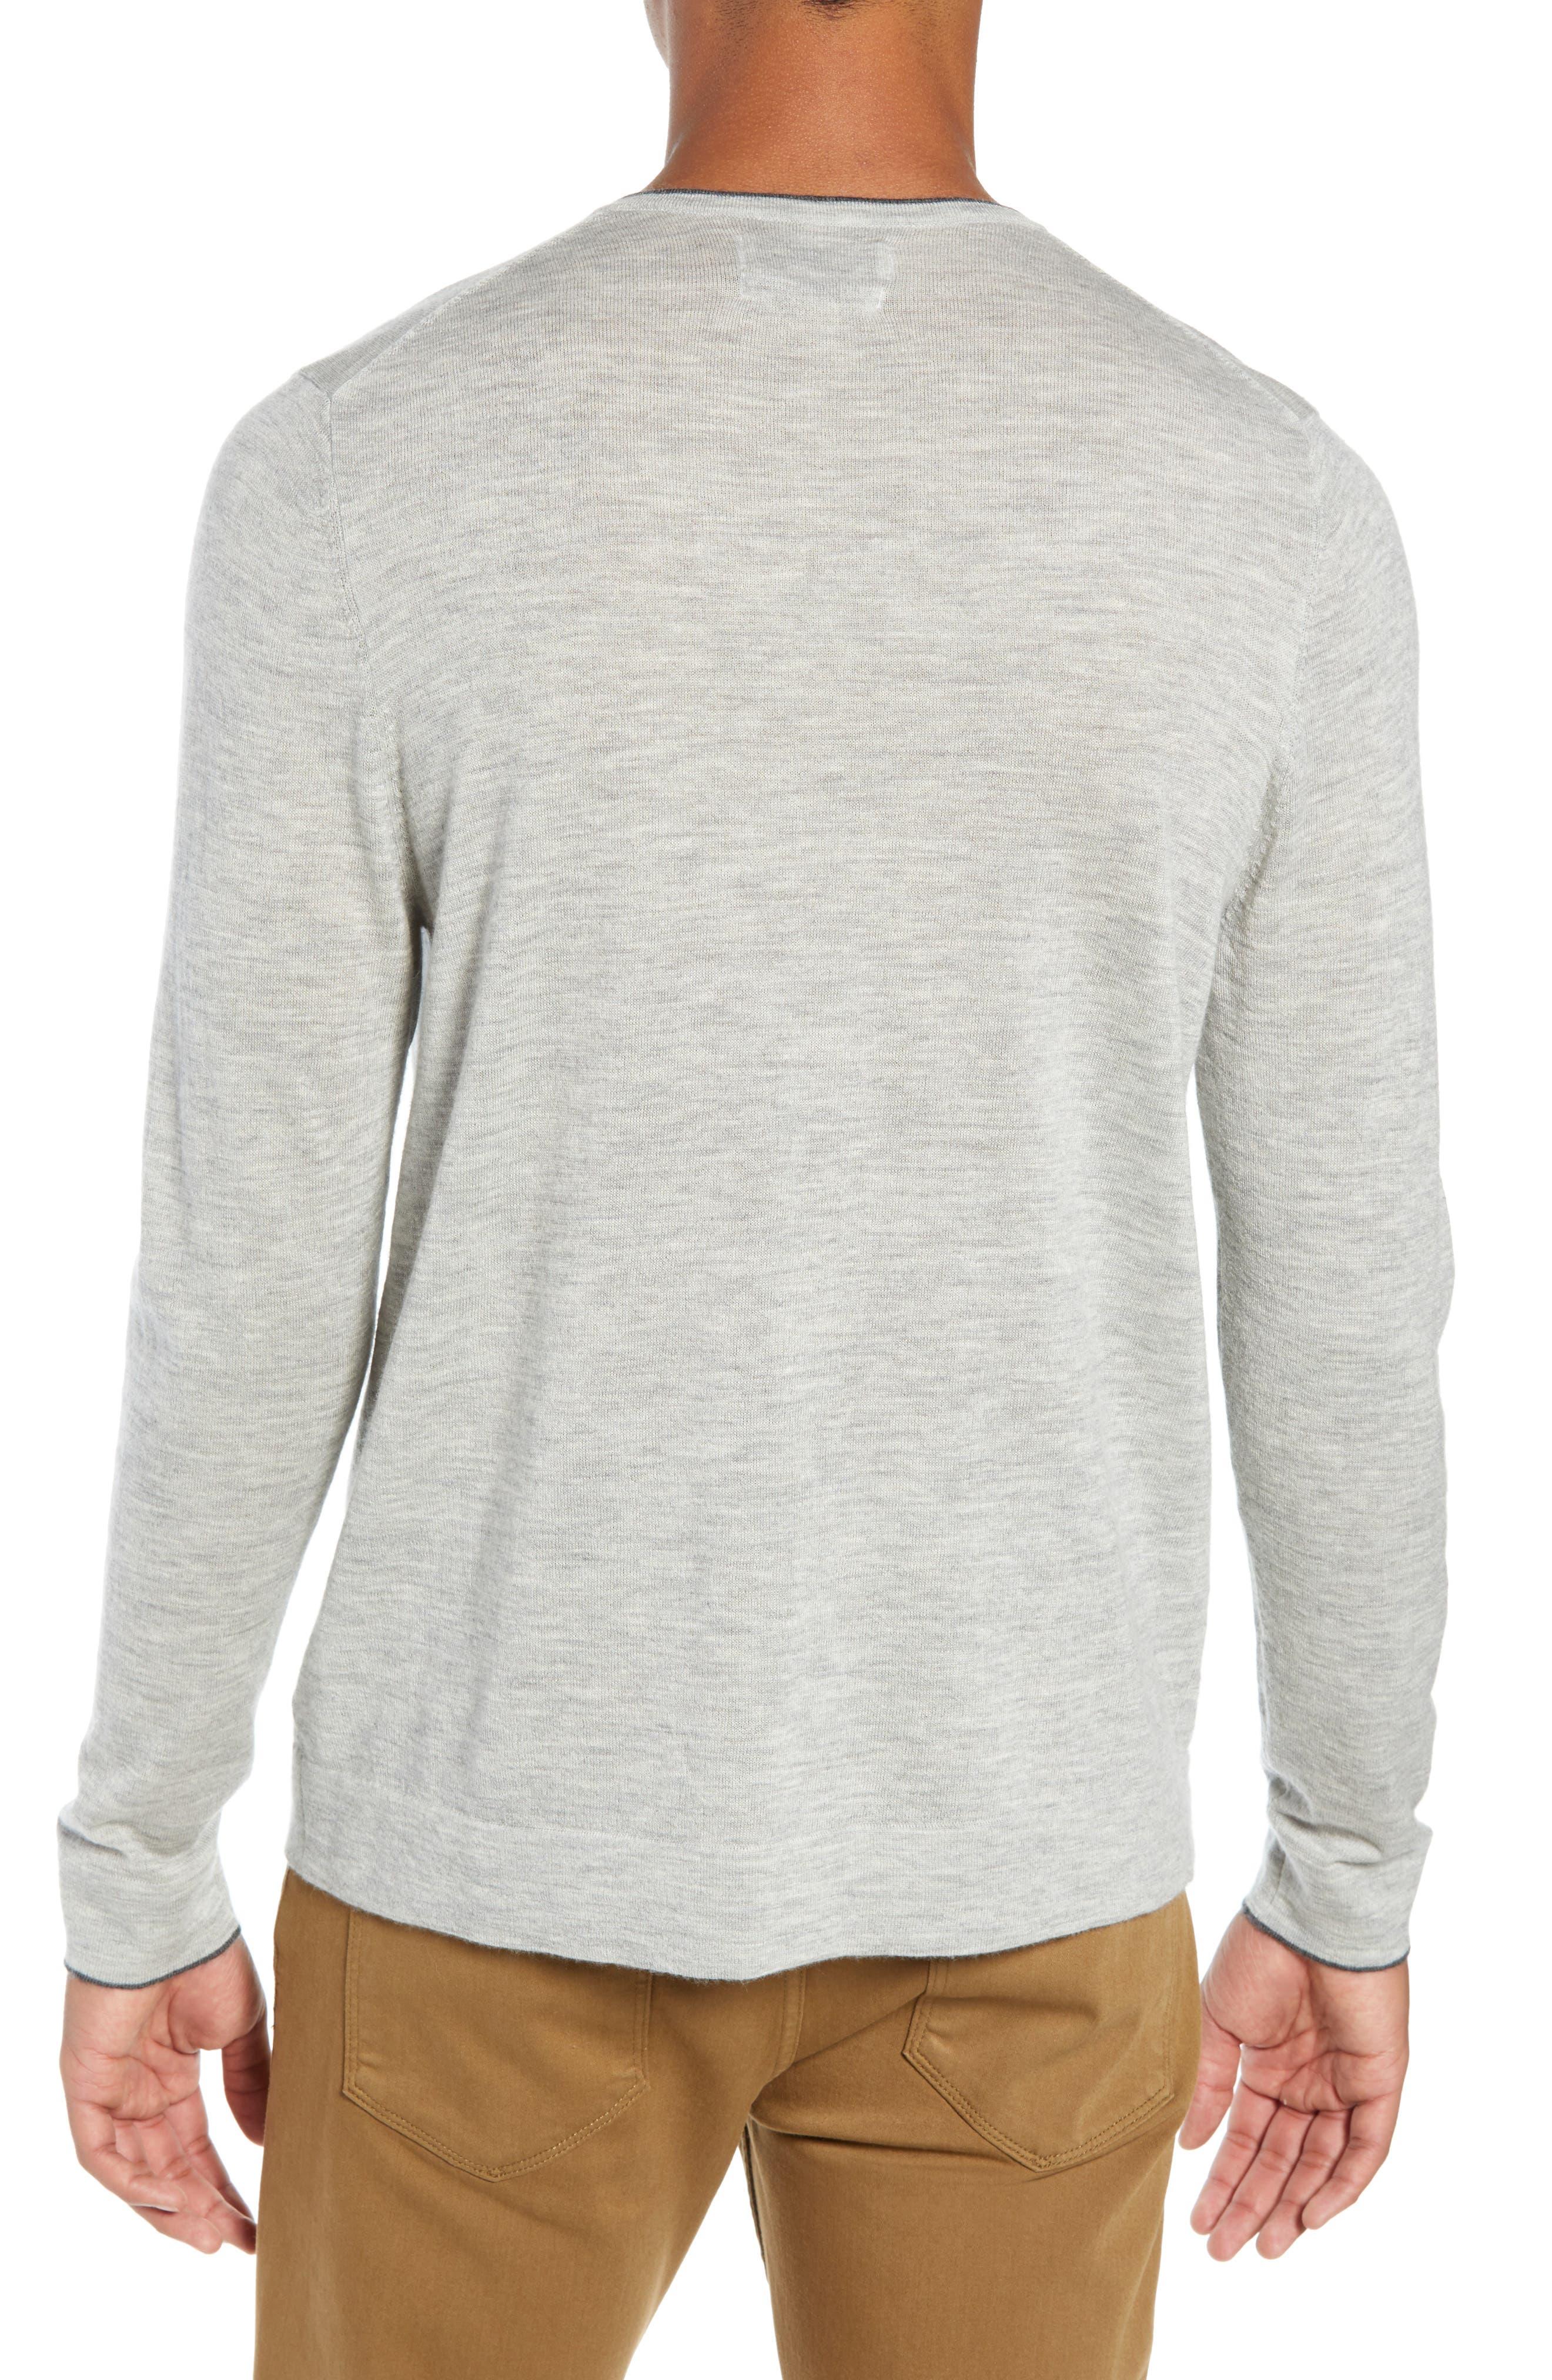 NORDSTROM SIGNATURE,                             Cashmere V-Neck Sweater,                             Alternate thumbnail 2, color,                             050